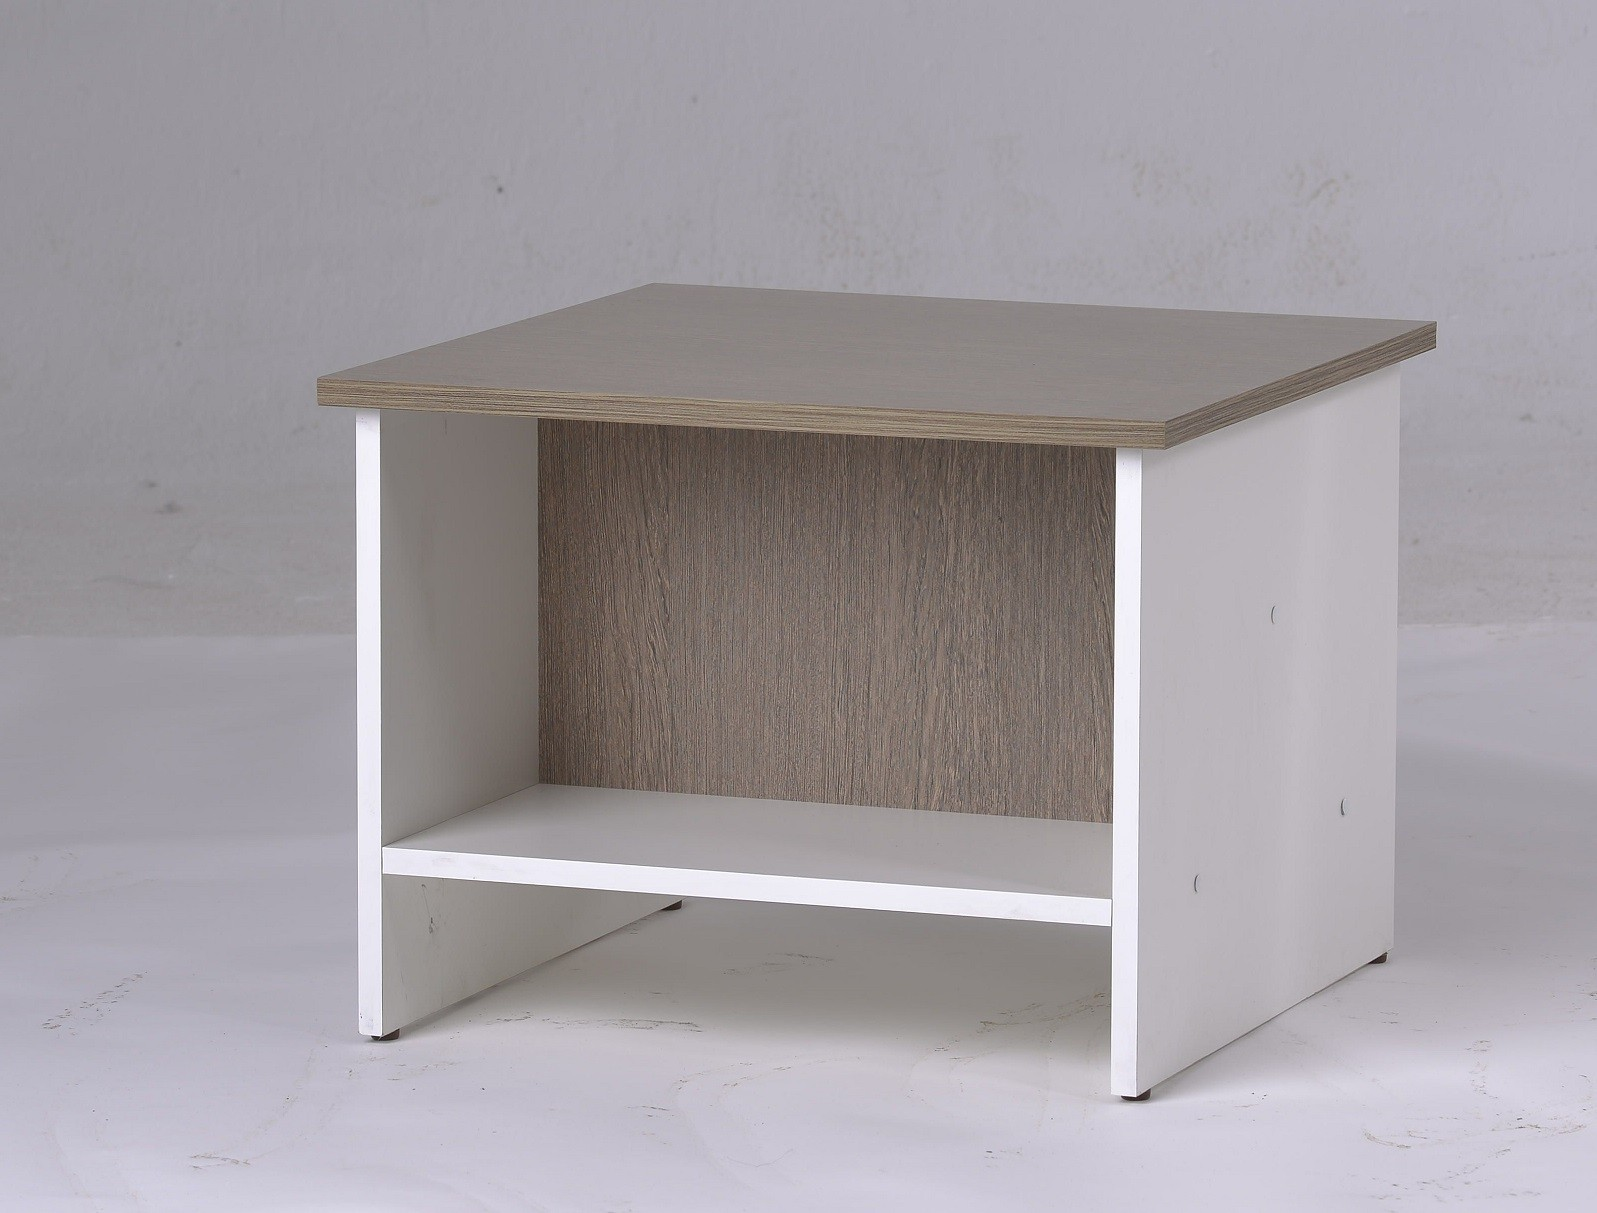 Table lart du meuble rades lart du meuble rades tunisie